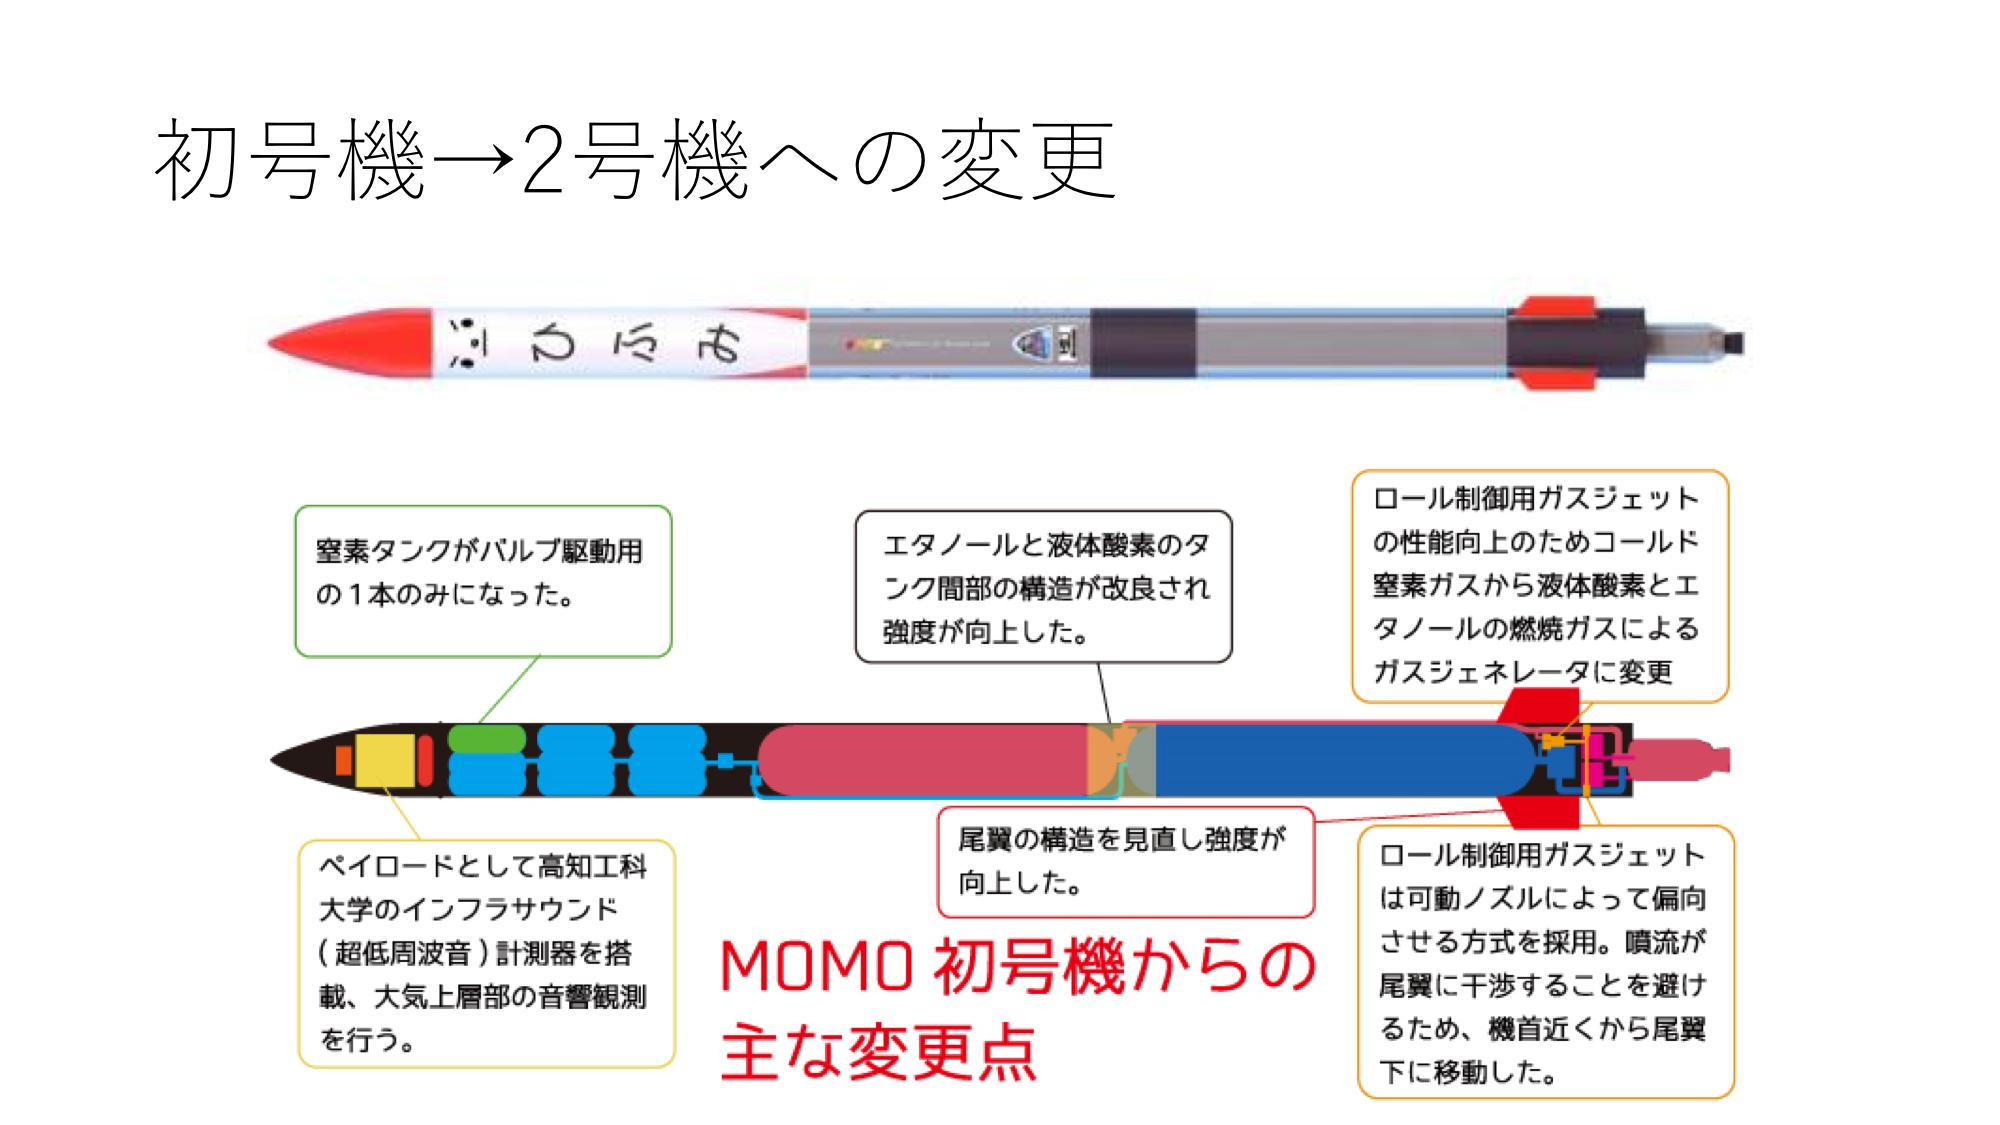 f:id:Imamura:20190414213953p:plain